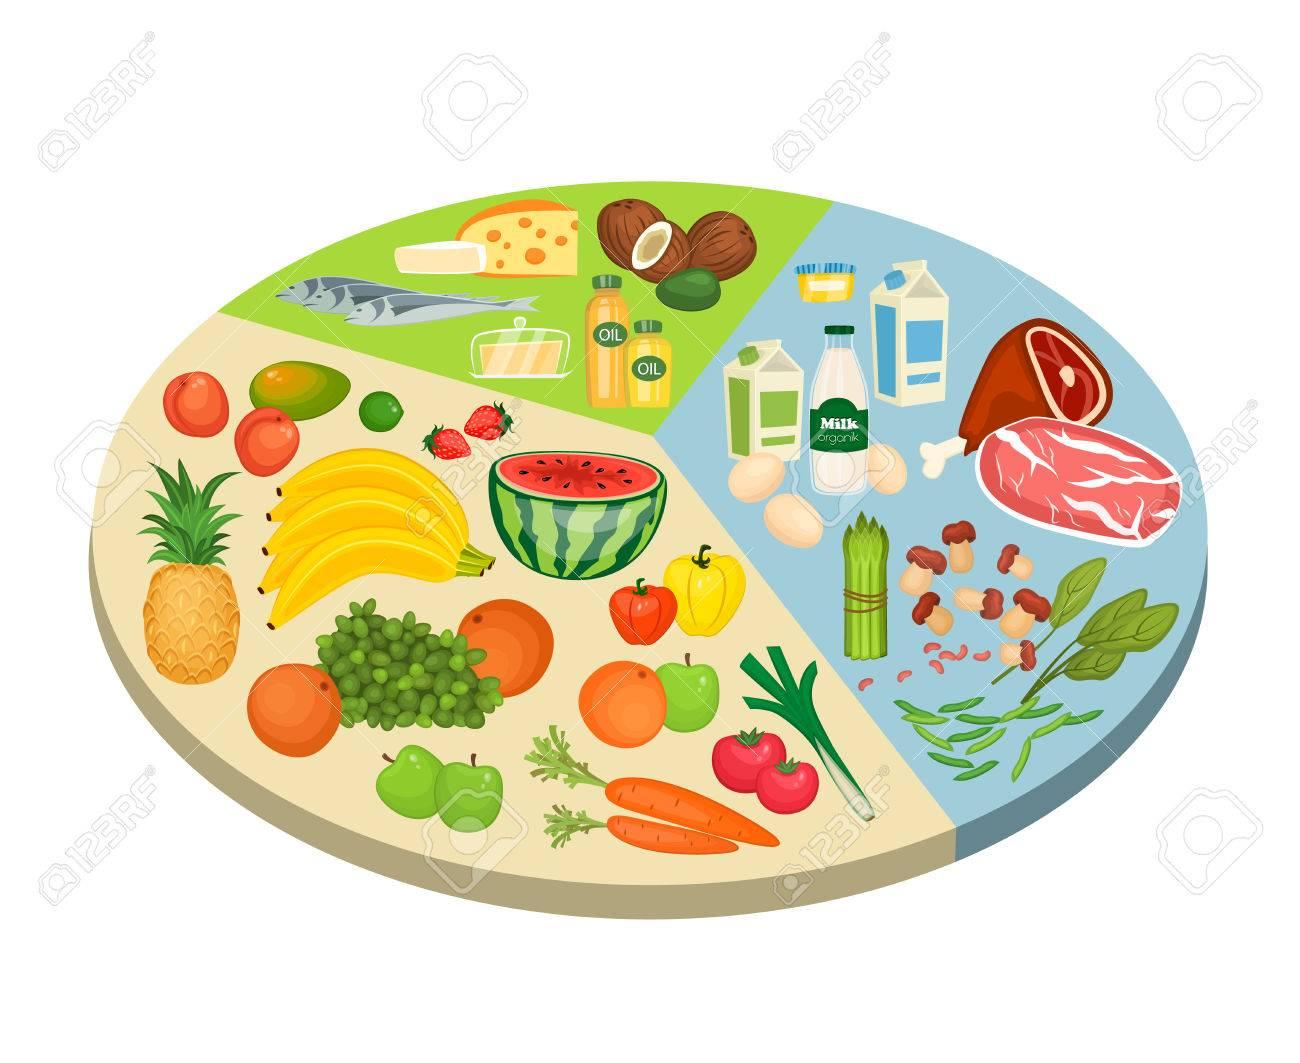 Food circle diagram fruits vegetables meat fish eggs nuts food circle diagram fruits vegetables meat fish eggs nuts nvjuhfo Gallery